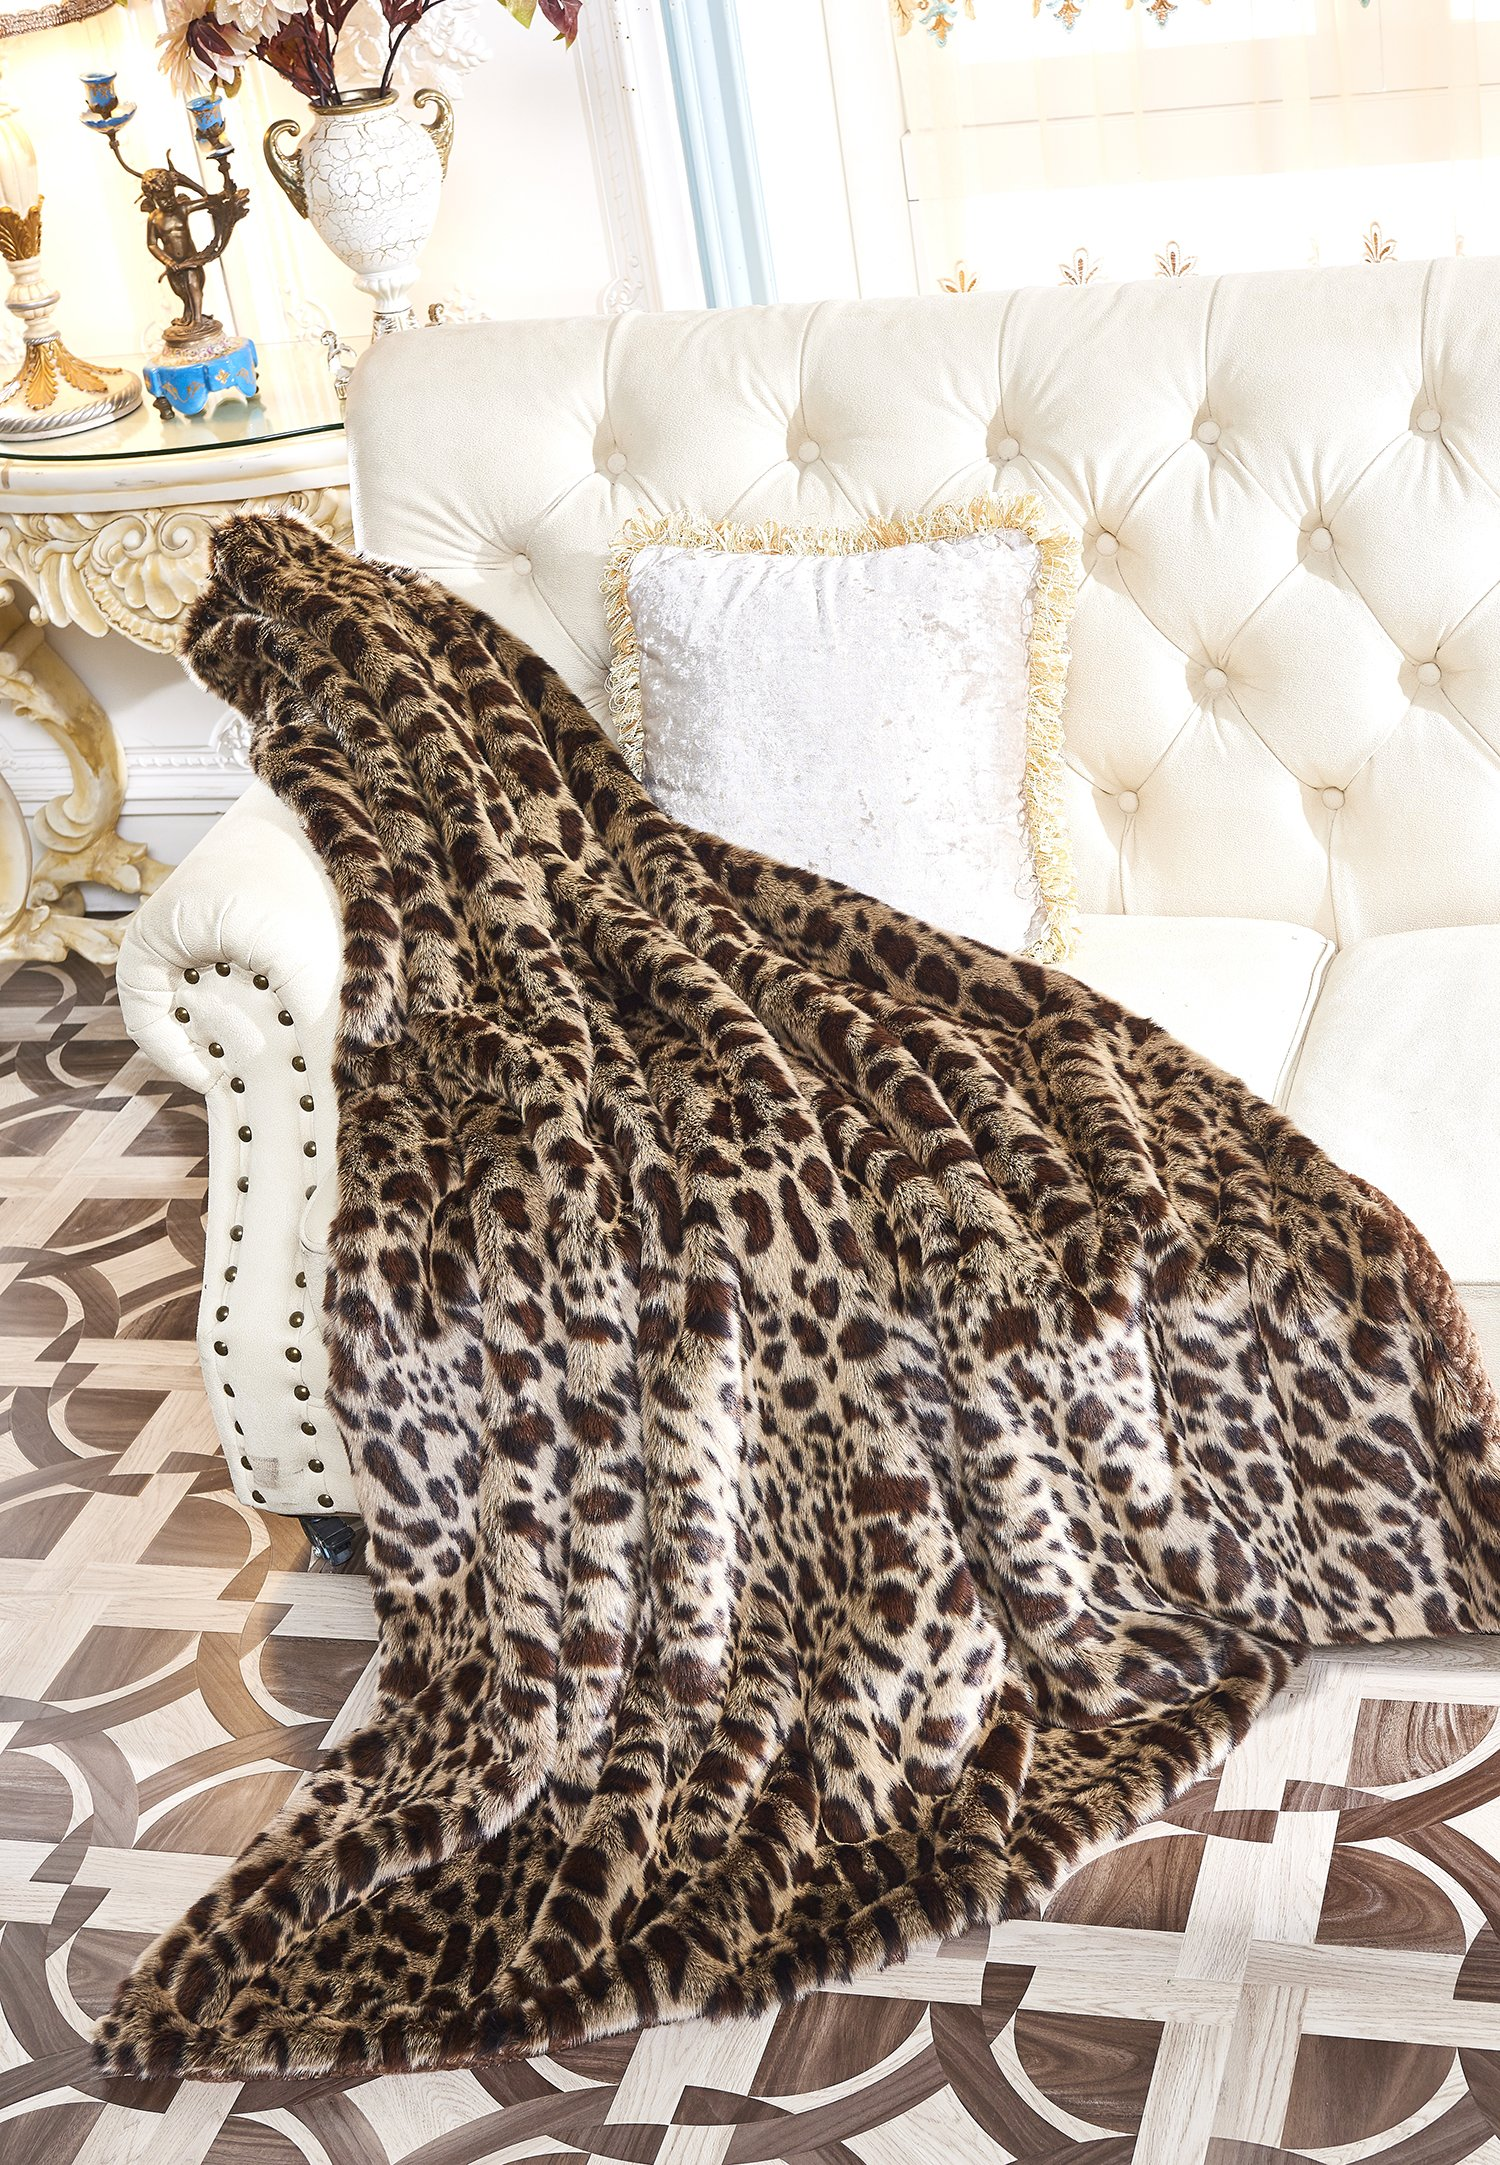 Lindsey Home Fashion Faux Fur Throw, Fur Blankets Super Soft Japanese Kanekalon Fiber, Sheepskin, Mink, Wolf, Bear, 60''x80'', 60''x70'', 50''x60'' 14 Colors (60x70(INCH), Dark Leopard) by Lindsey Home Fashion (Image #2)